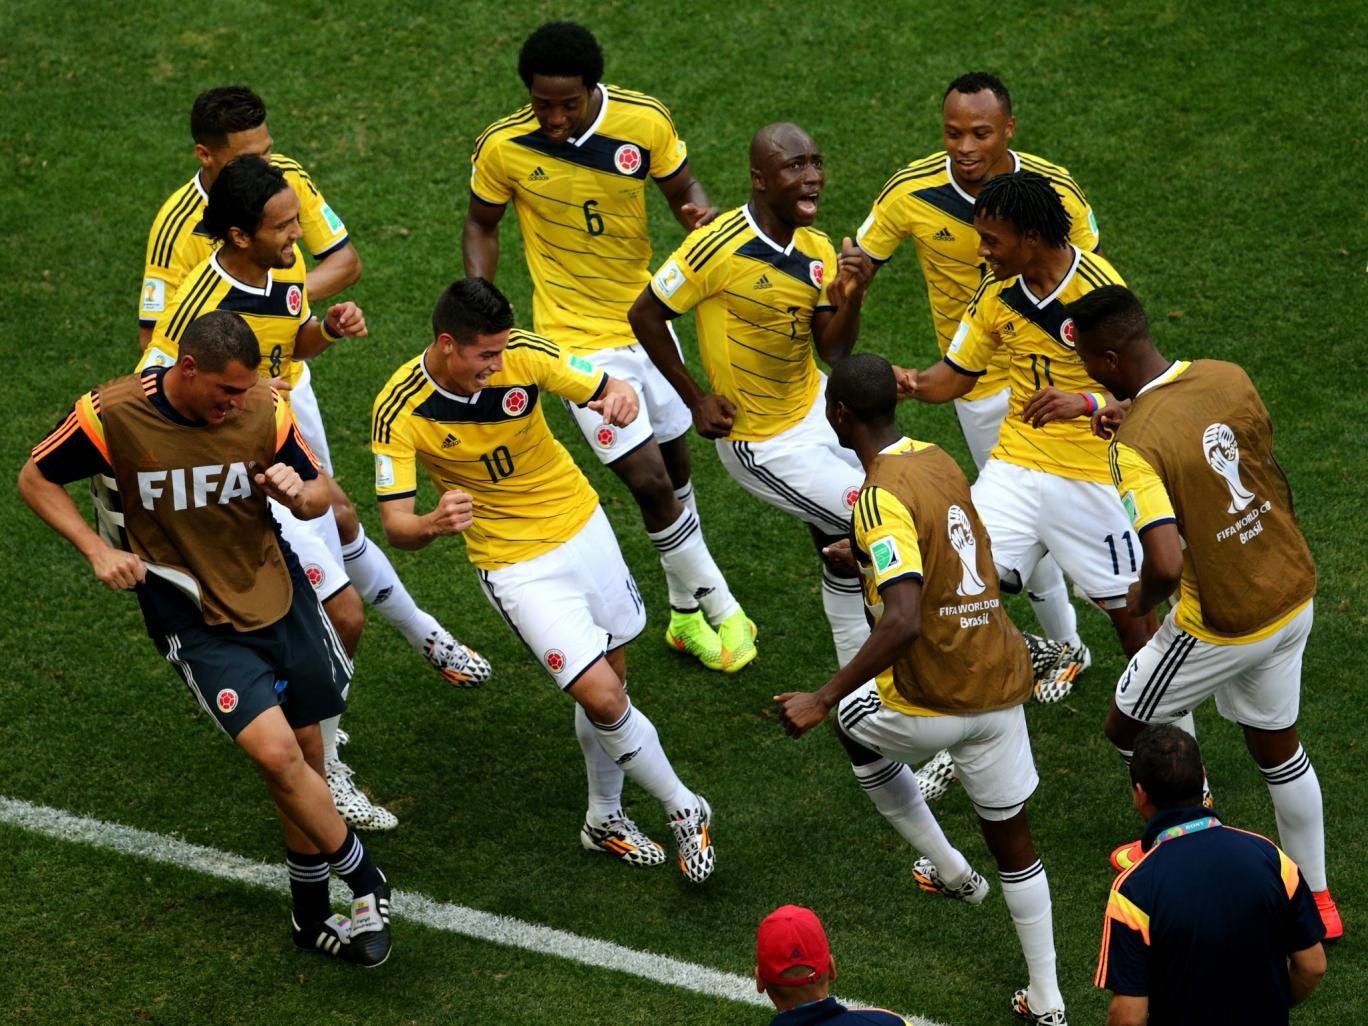 James Rodriguez celebrates scoring for Colombia